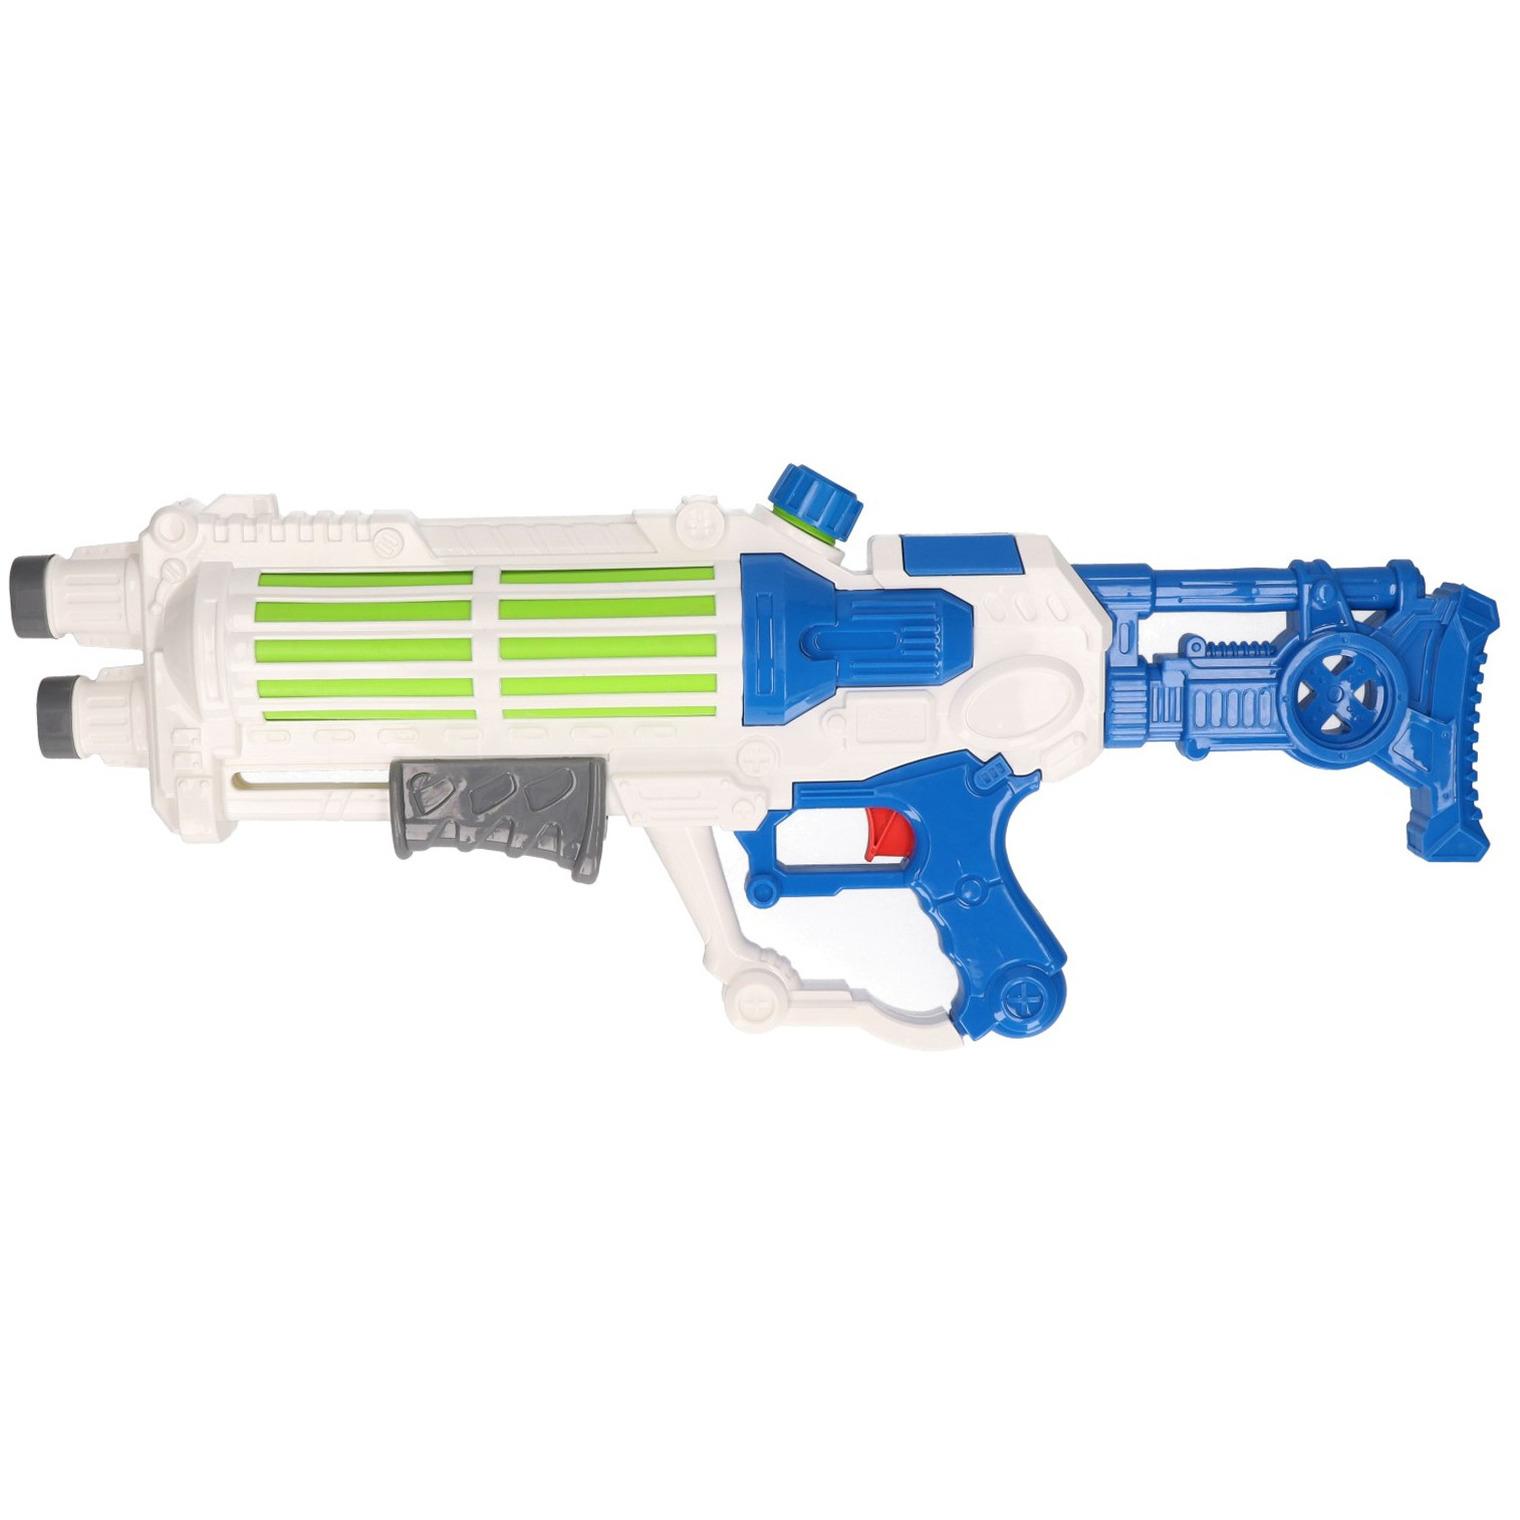 Waterpistool met pomp 58 cm Geen Waterspeelgoed